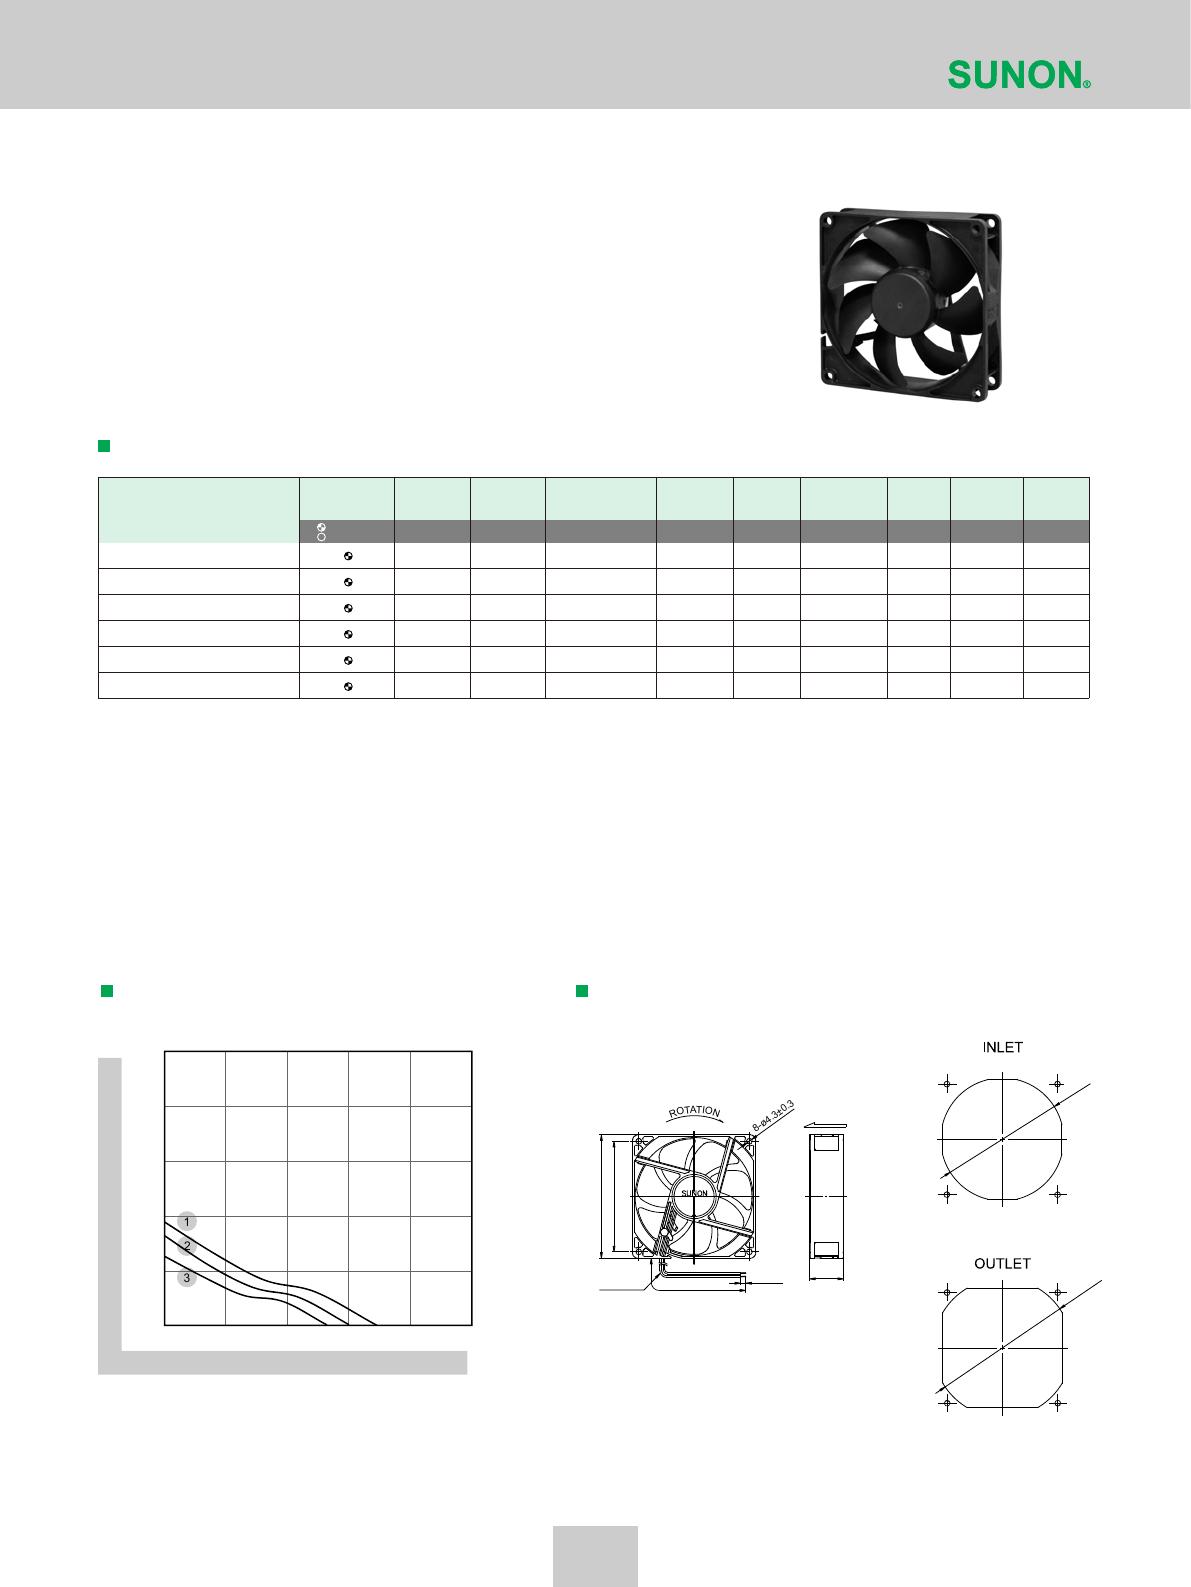 hight resolution of innoviative 260 4400 1 part for 12v led wiring diagram wiring diagram innoviative 260 4400 1 part for 12v led wiring diagram